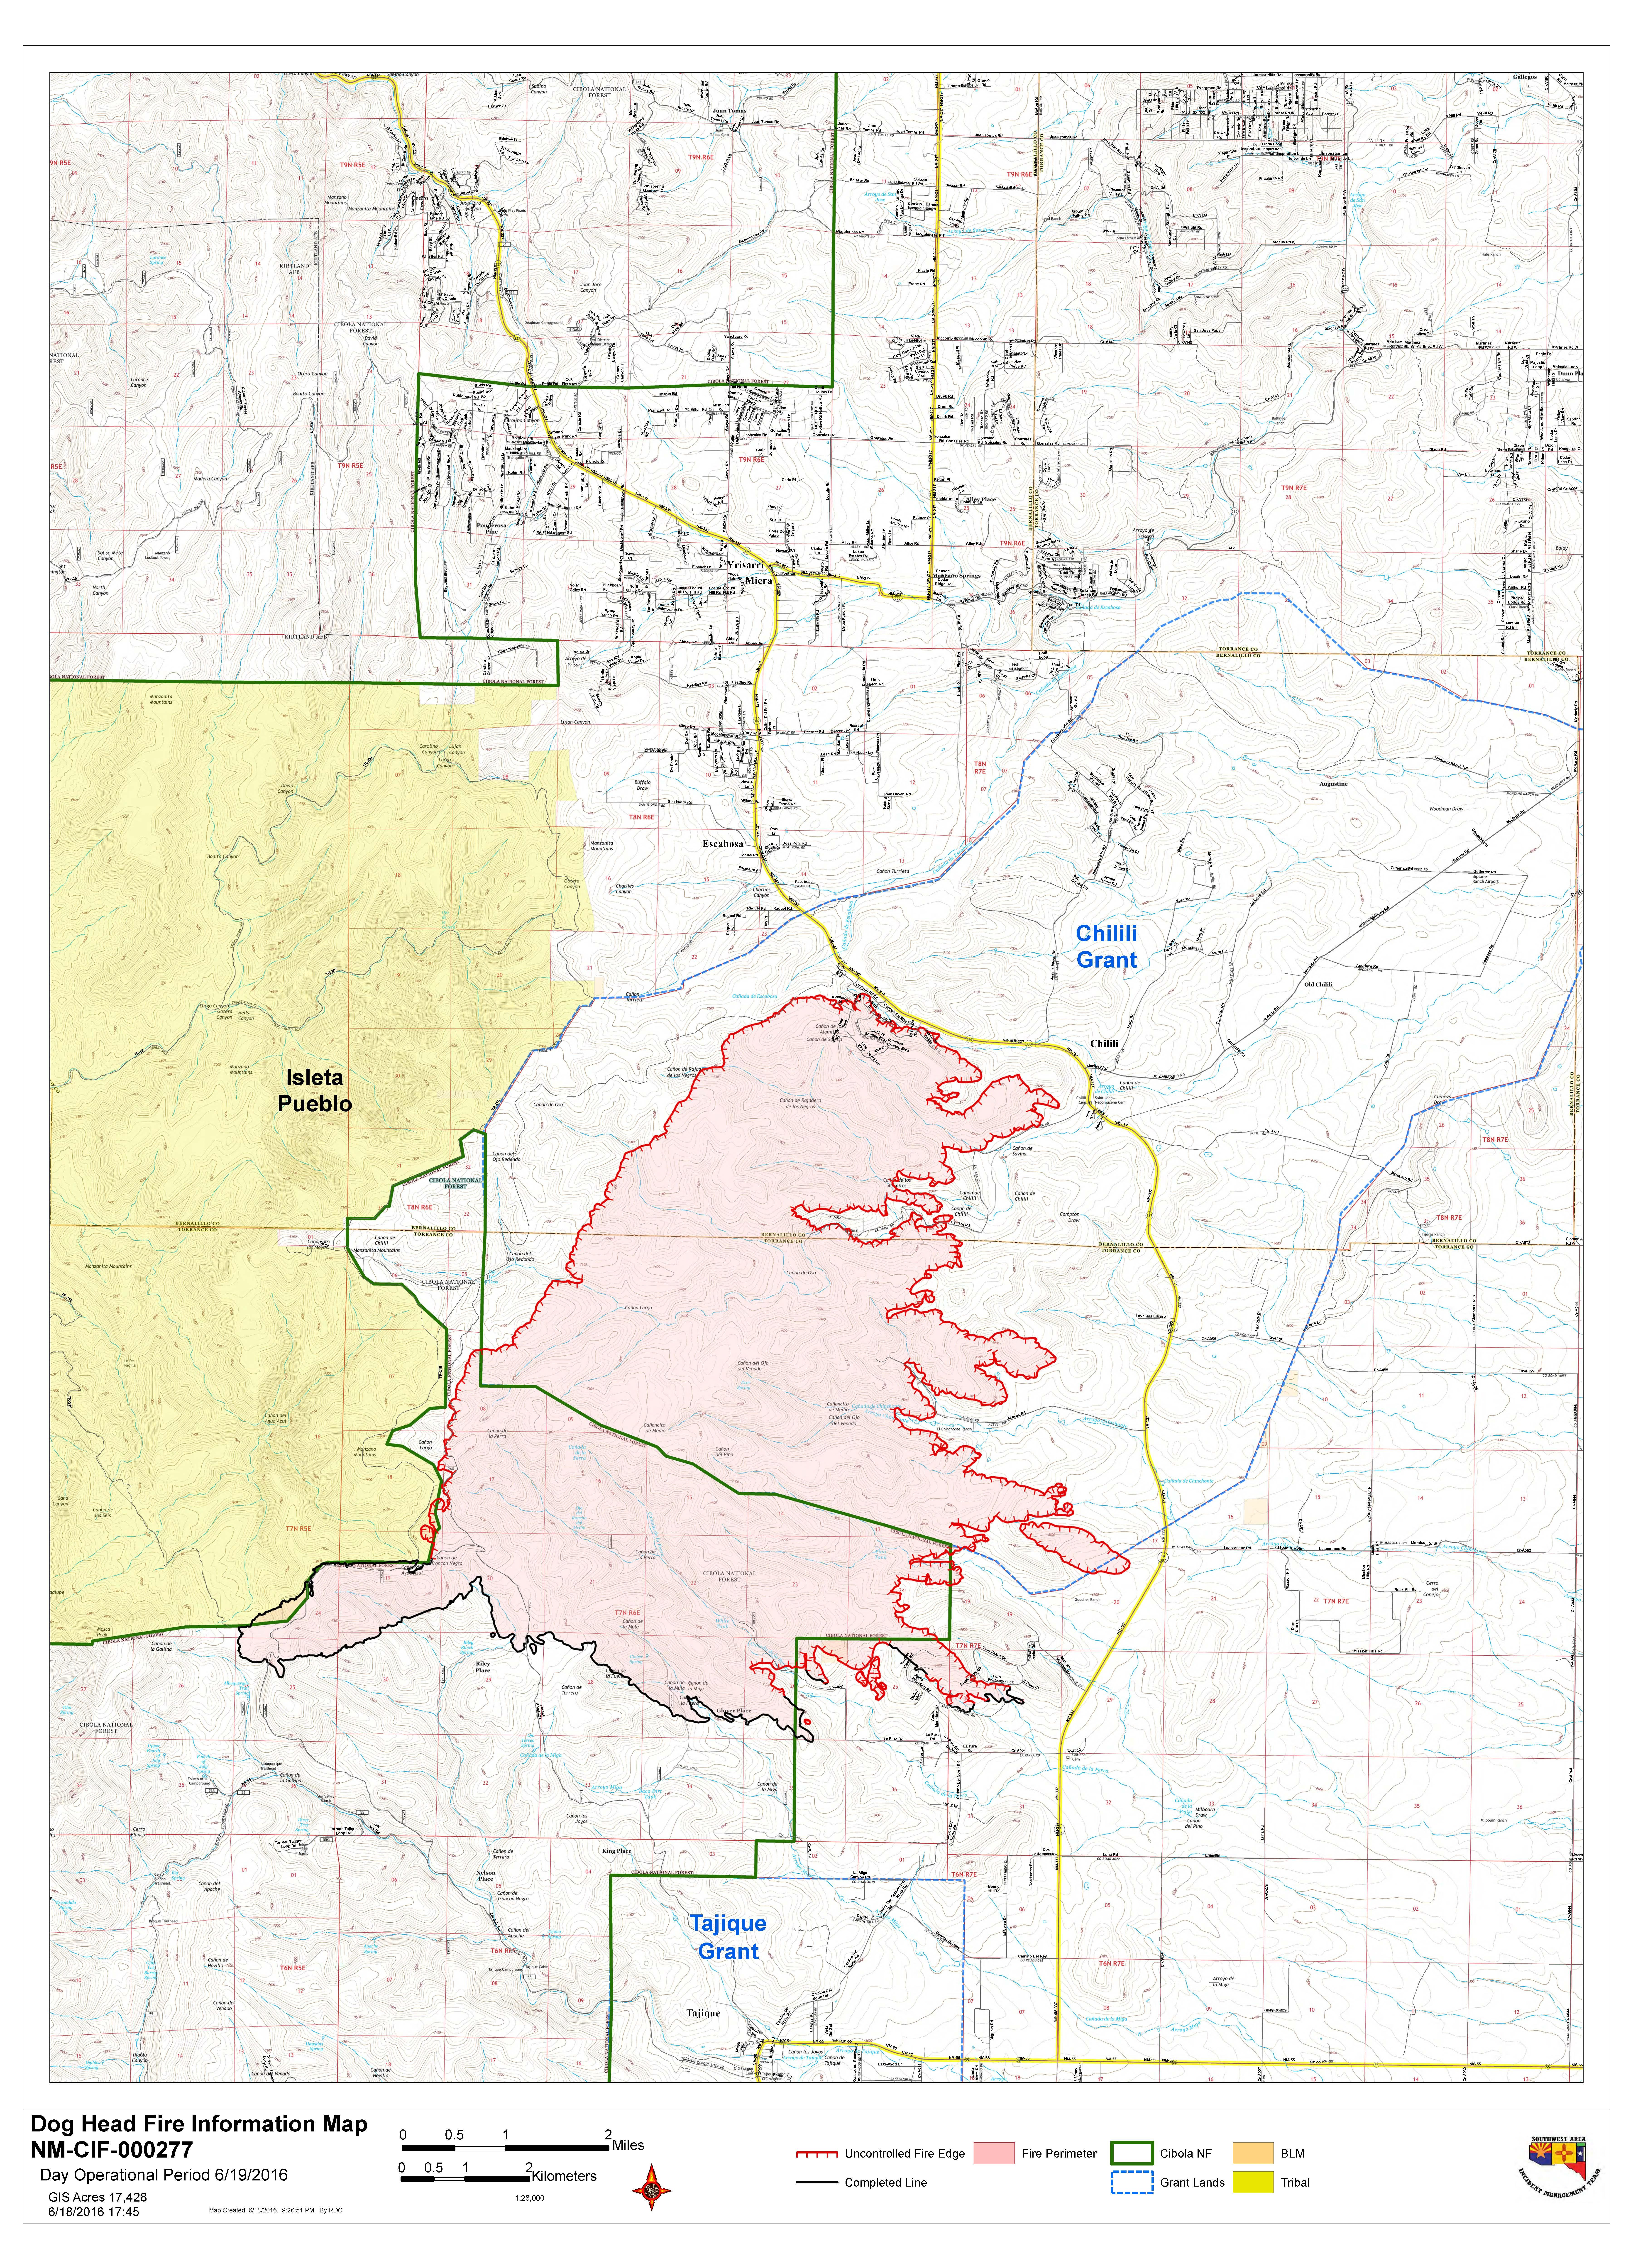 Dog Head Fire Incident Maps June 19th | NM Fire Info